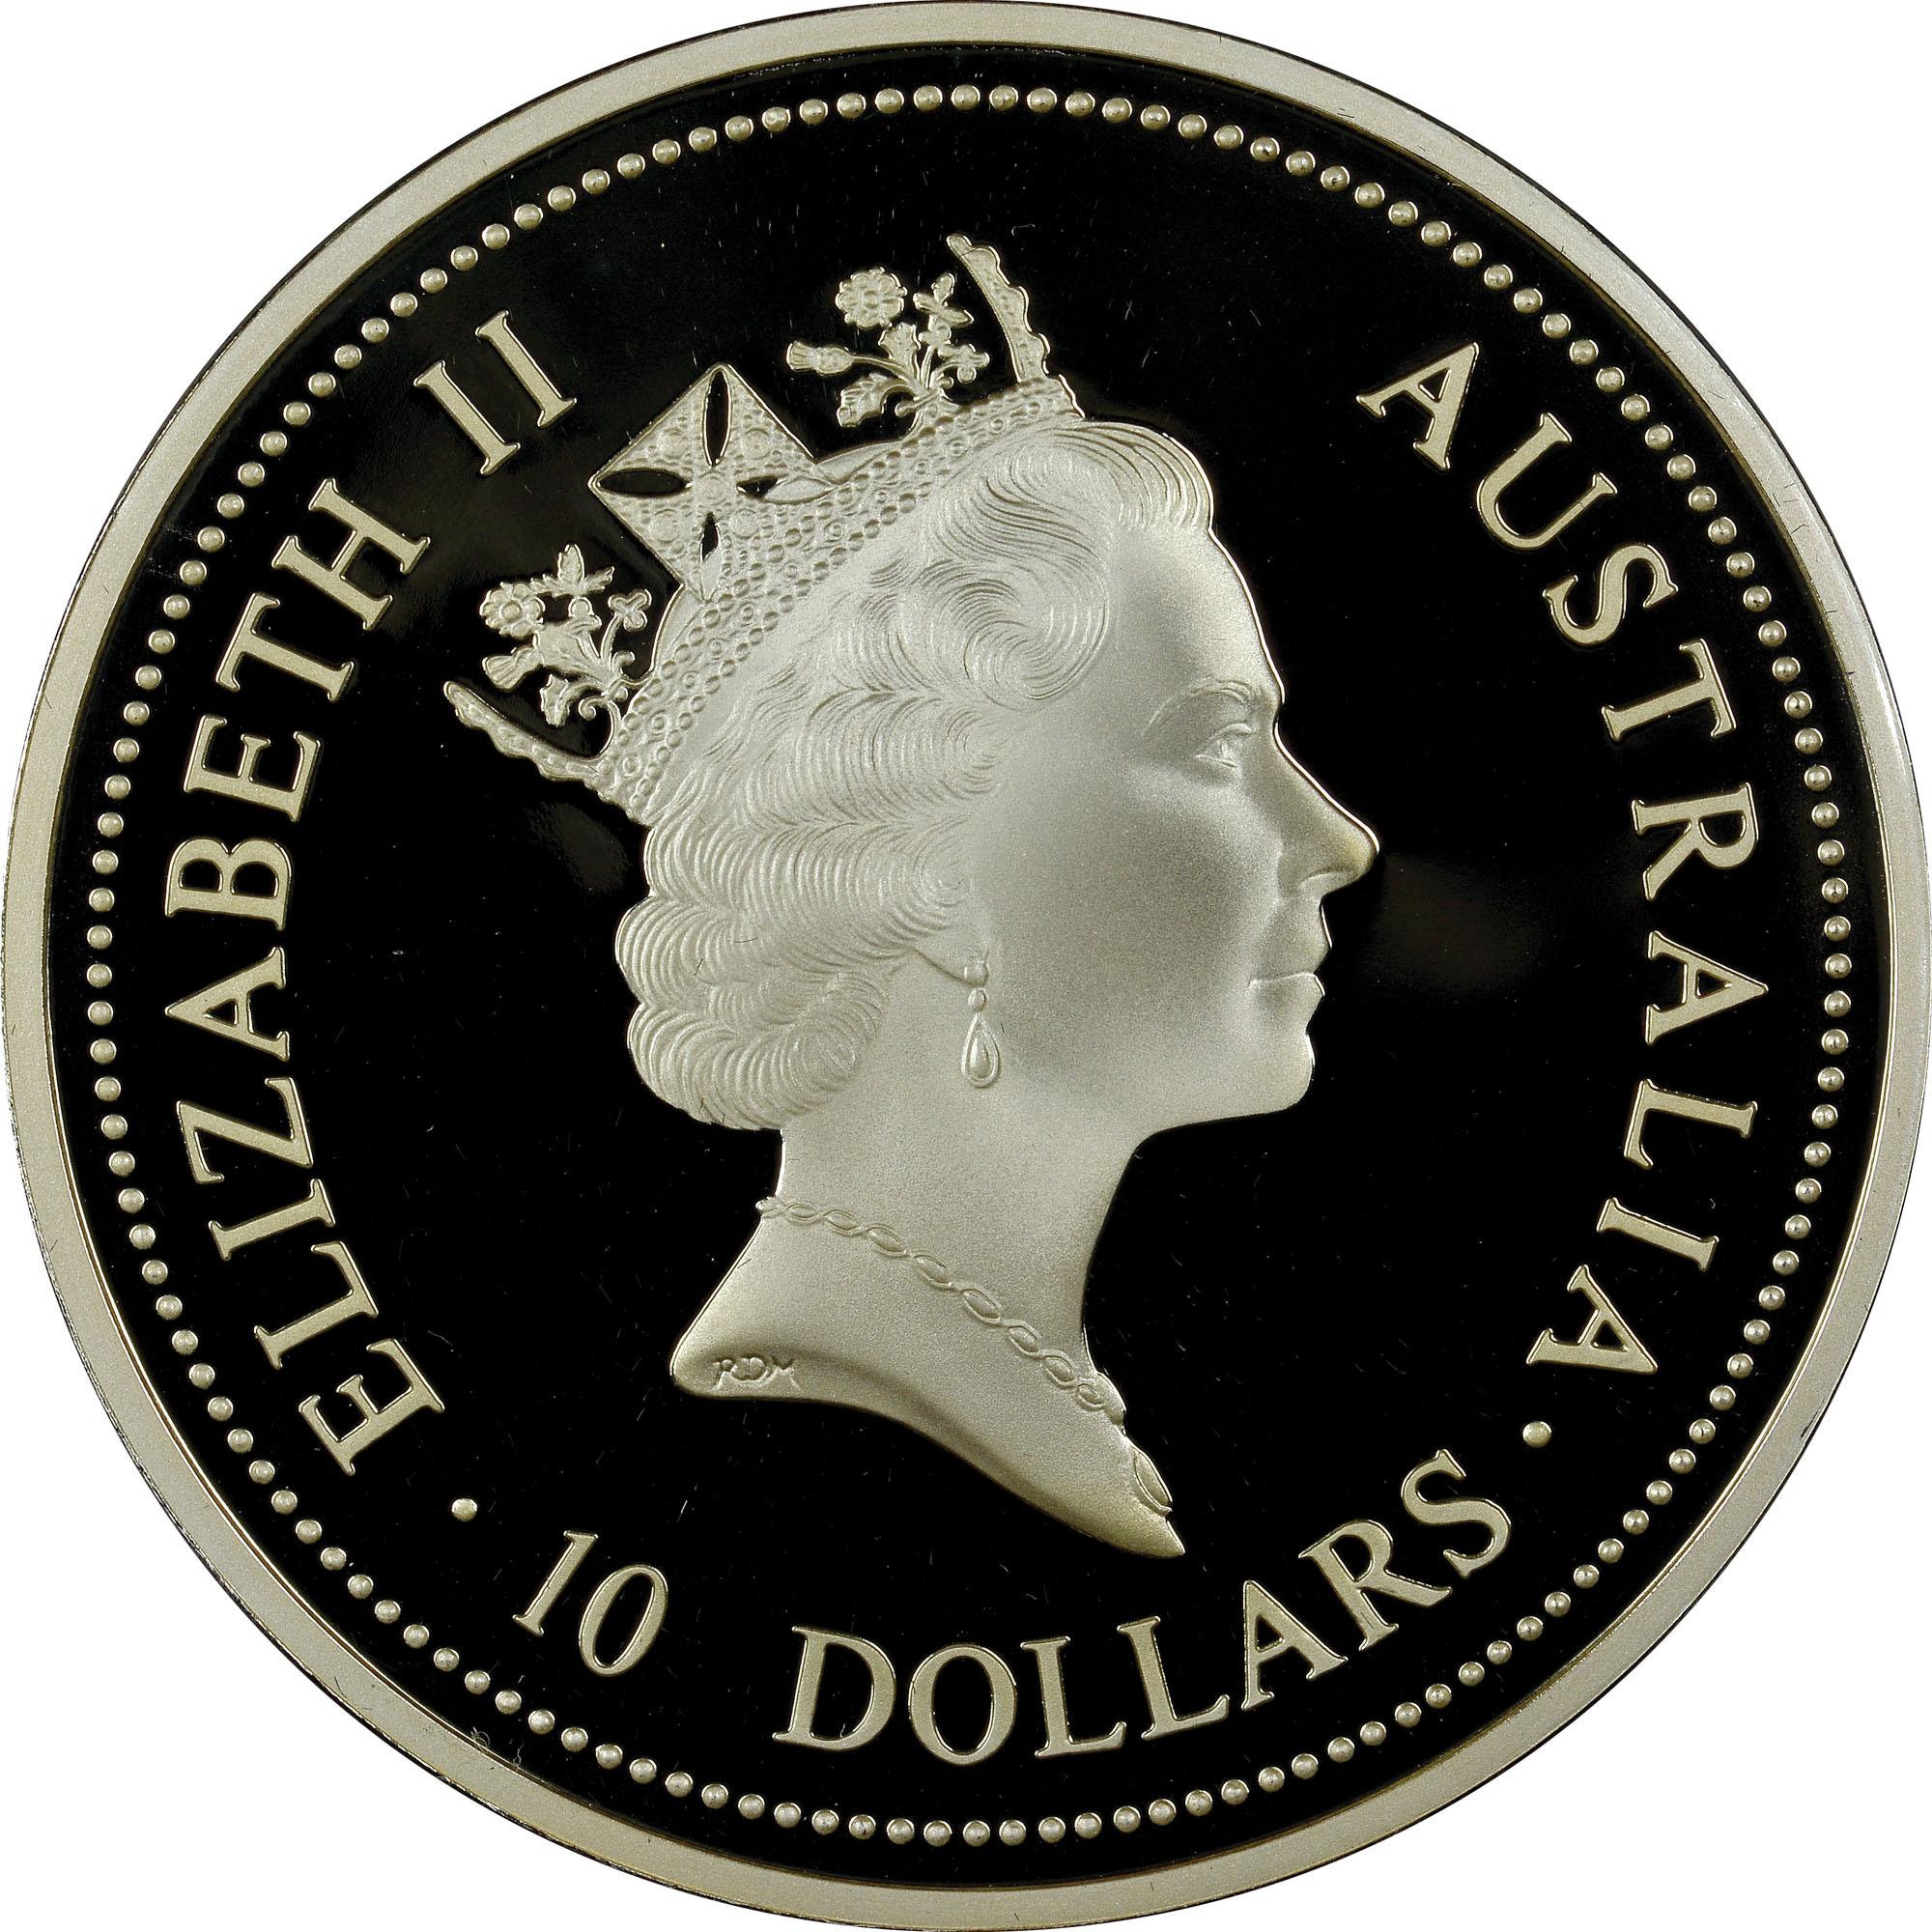 1995-1996 Australia 10 Dollars obverse